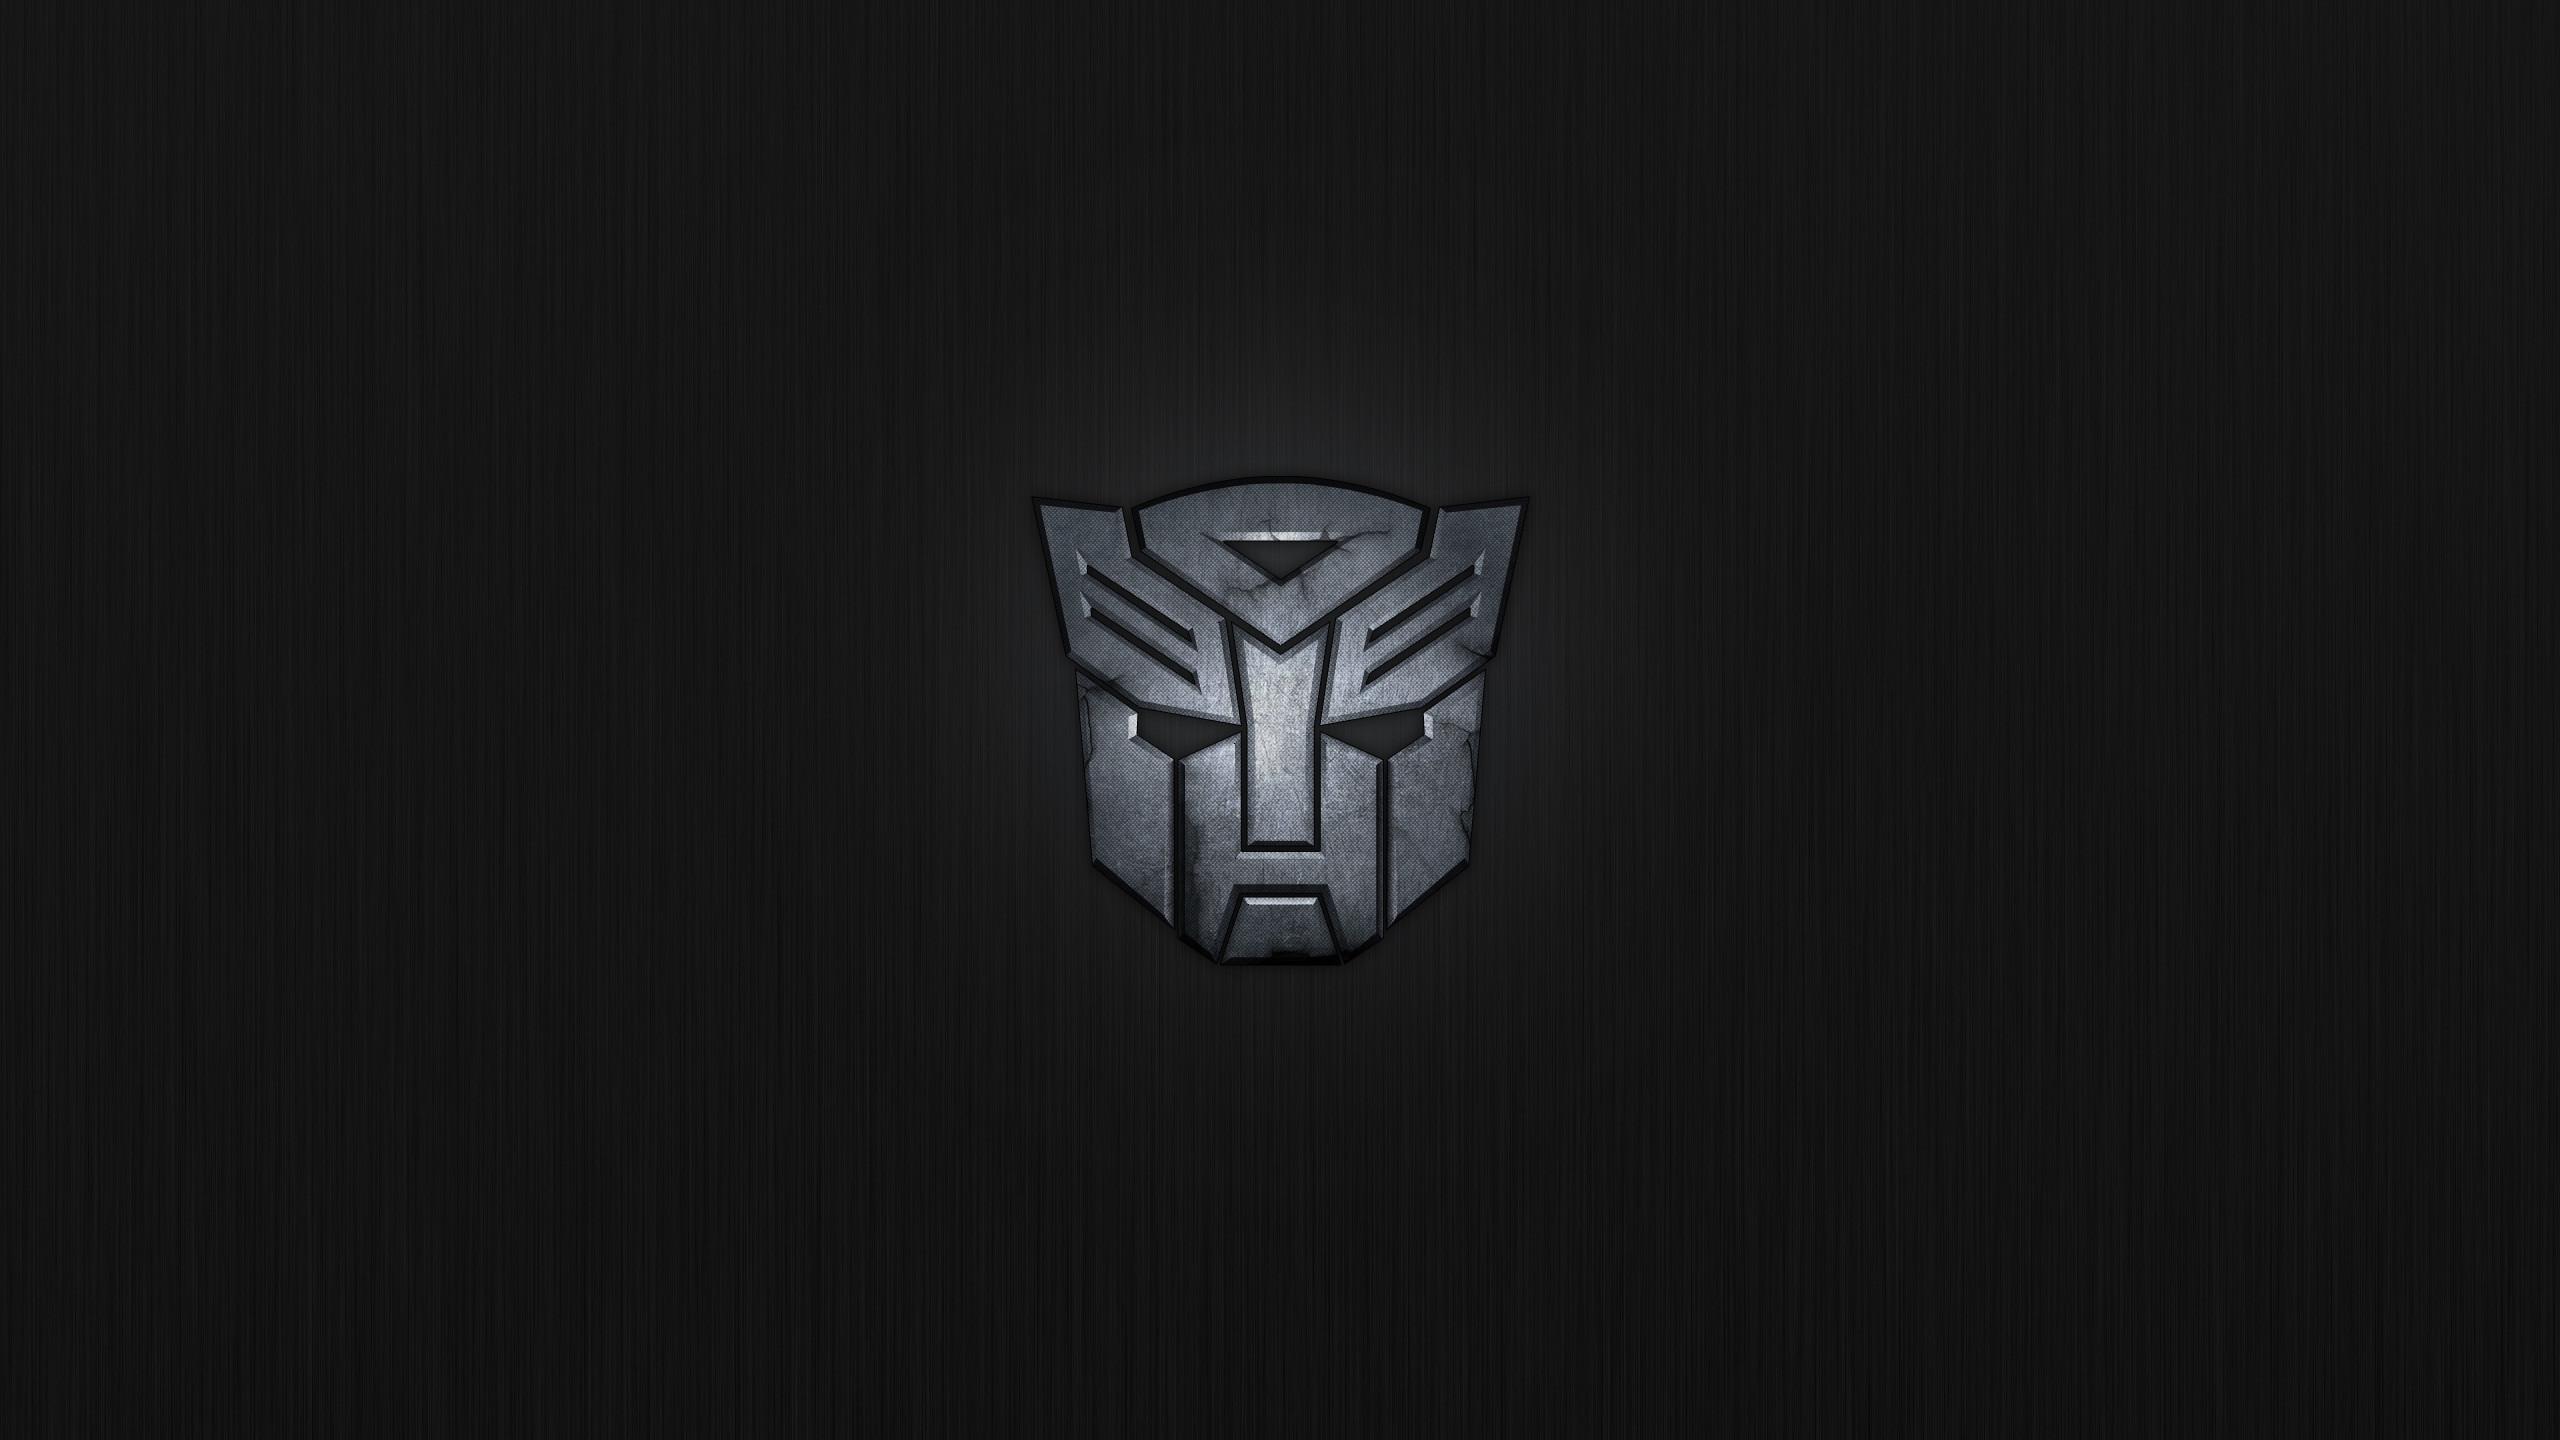 Transformers Fall Of Cybertron 4k Wallpaper G1 Transformers Wallpaper Hd 66 Images